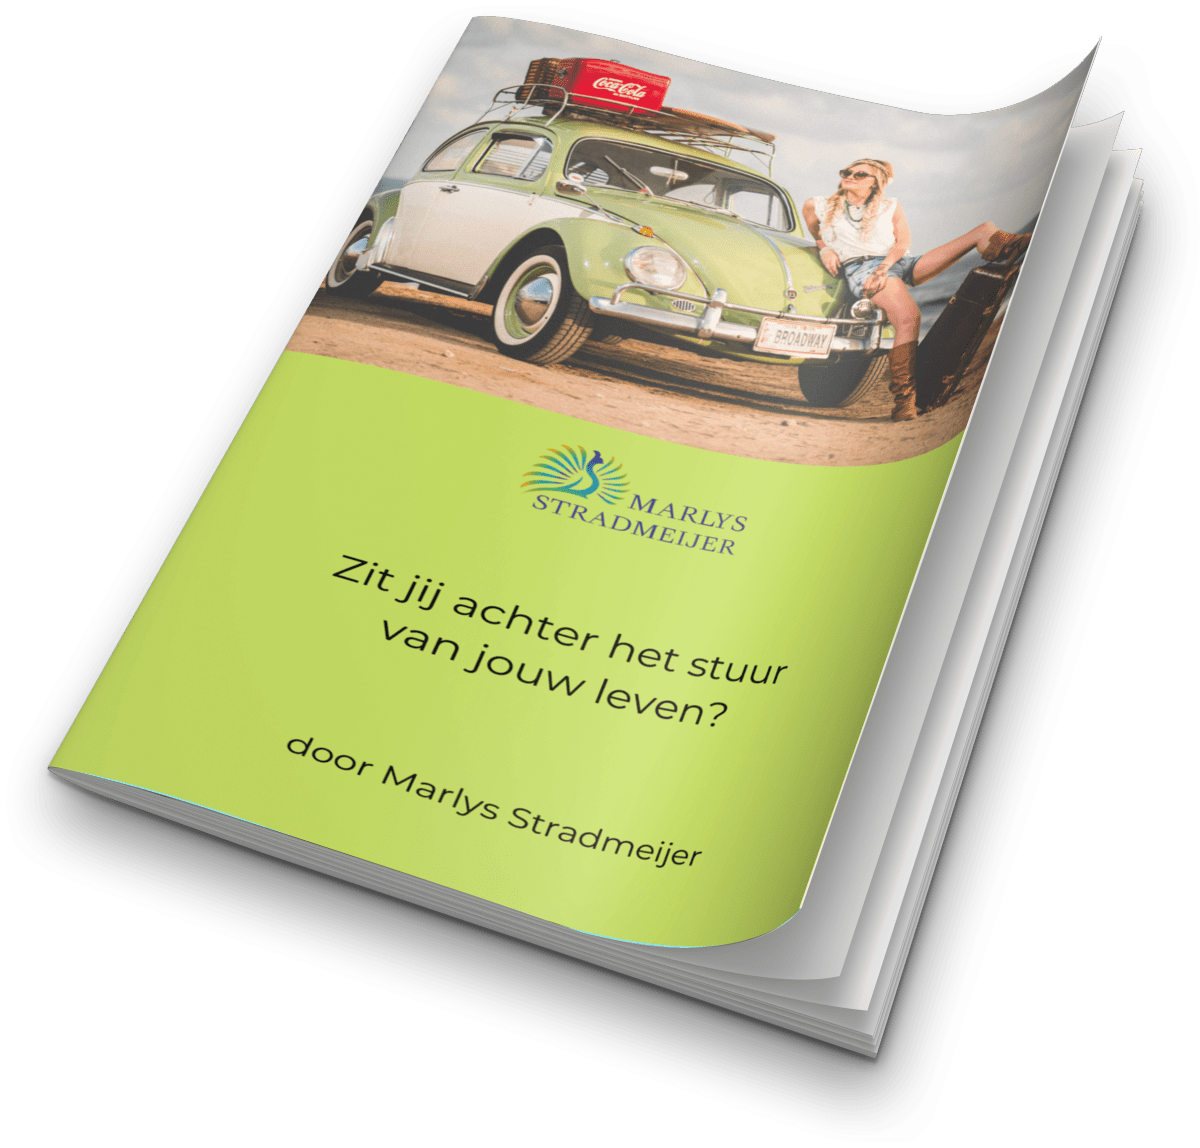 gratis e-book marlys stradmeijer